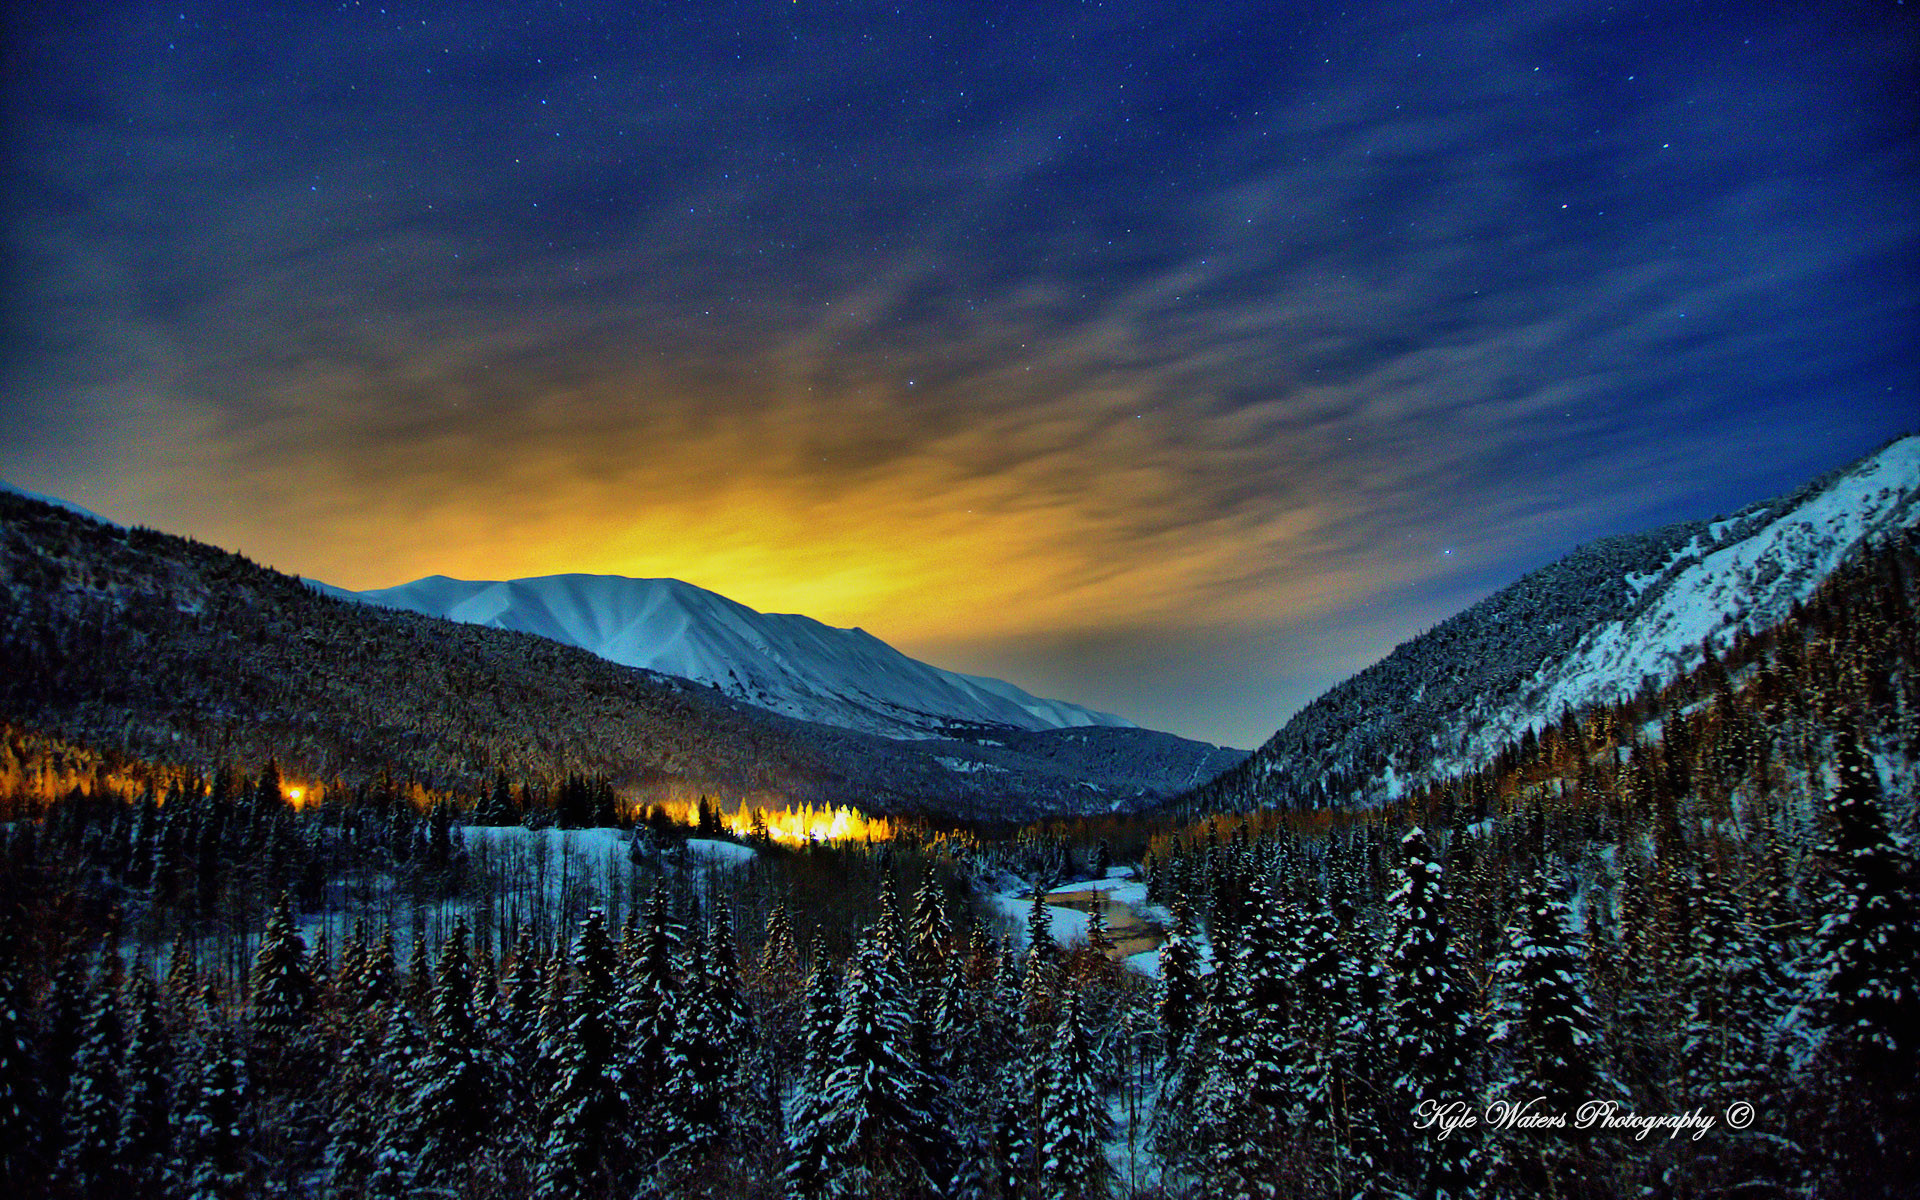 Alaska Winter Nights Wallpapers | HD Wallpapers